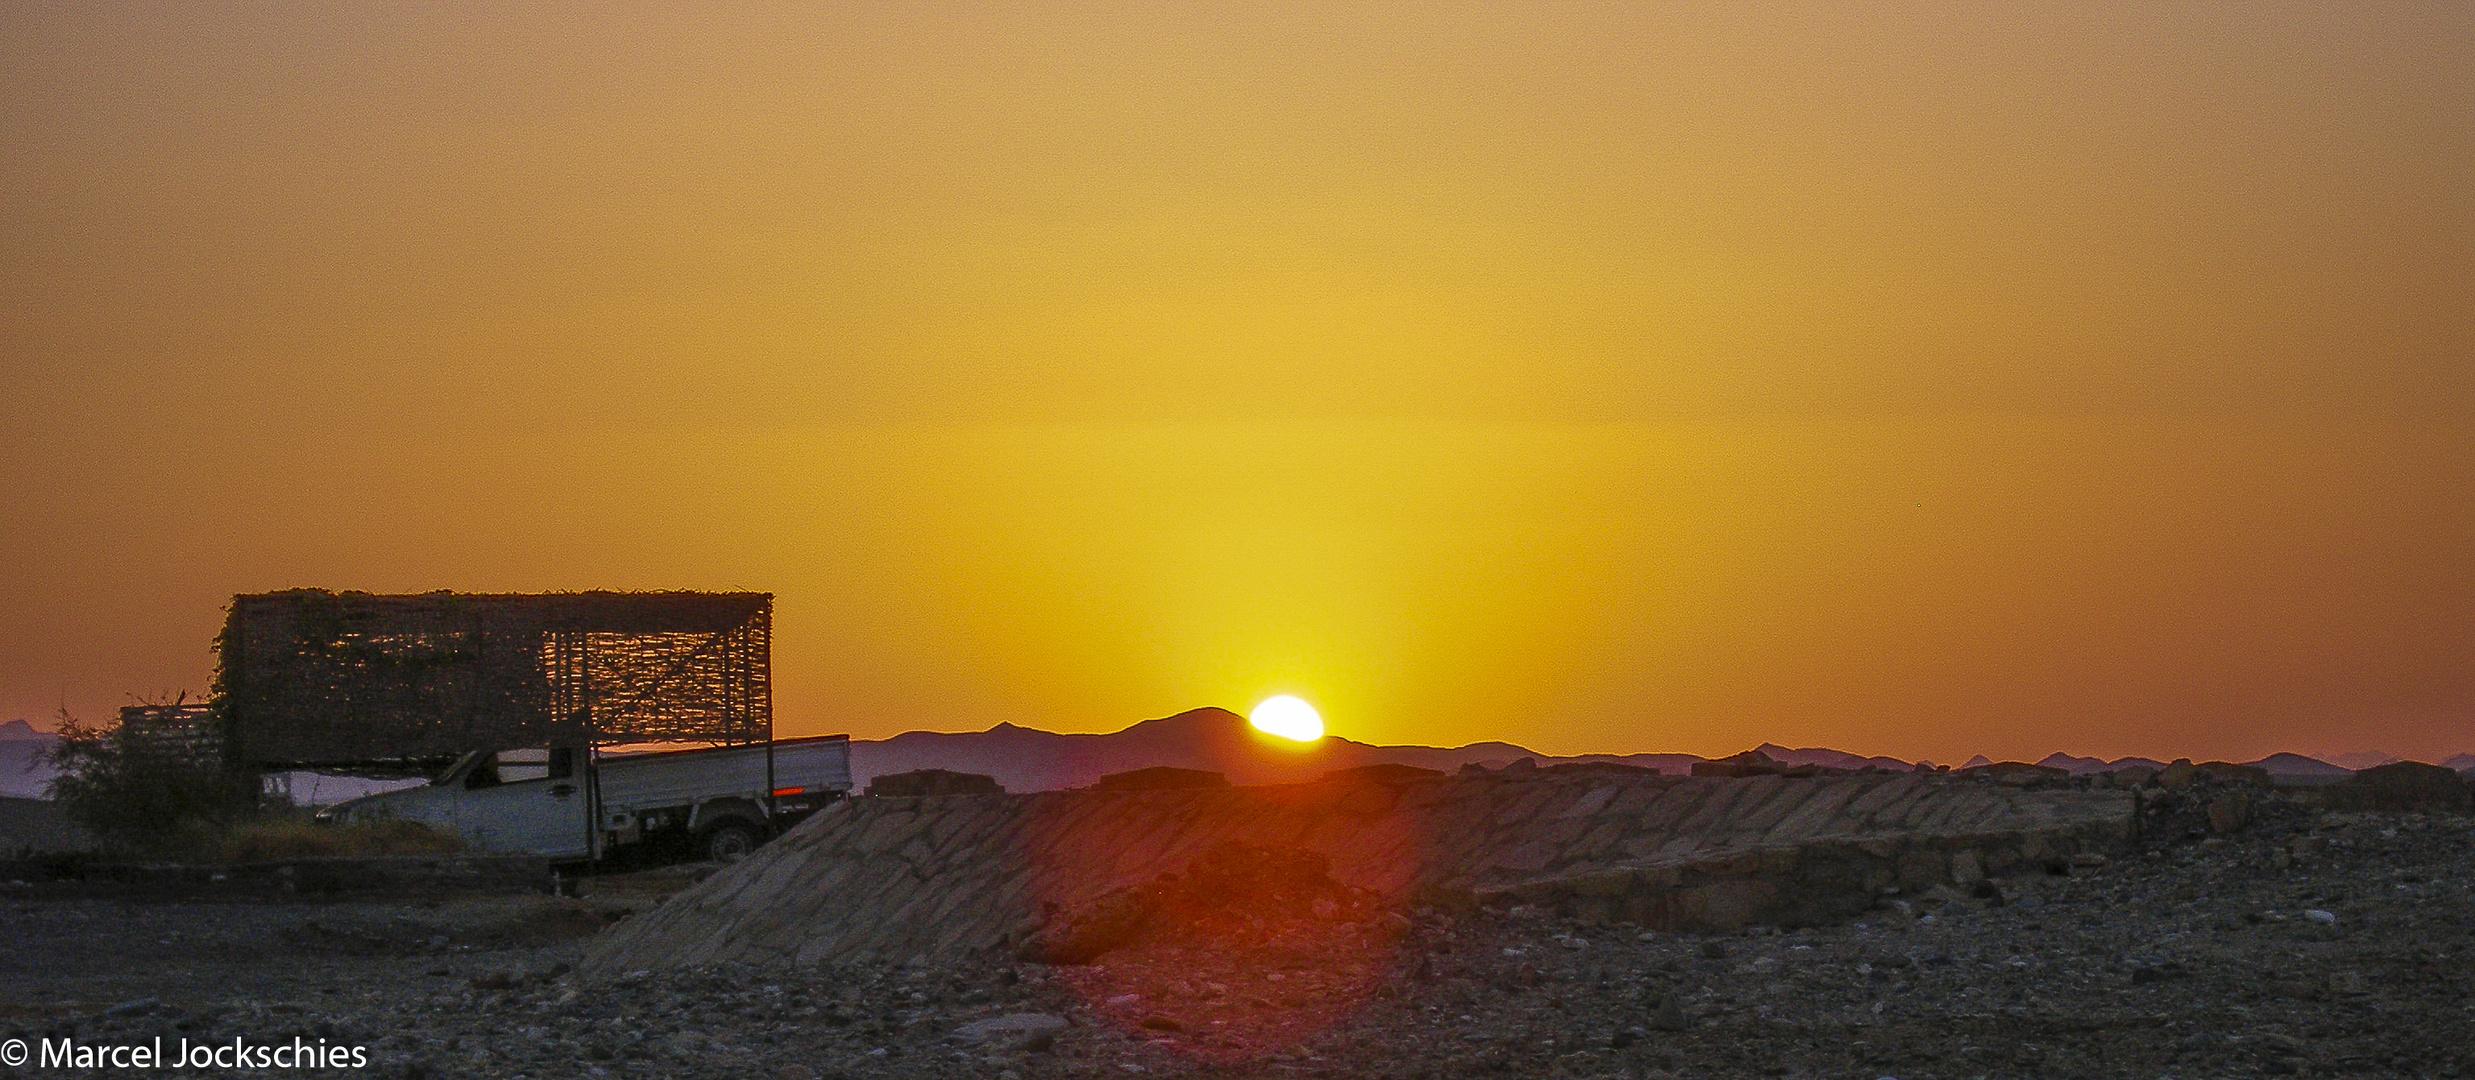 Sonnenuntergang in Ägypten (Safaga)